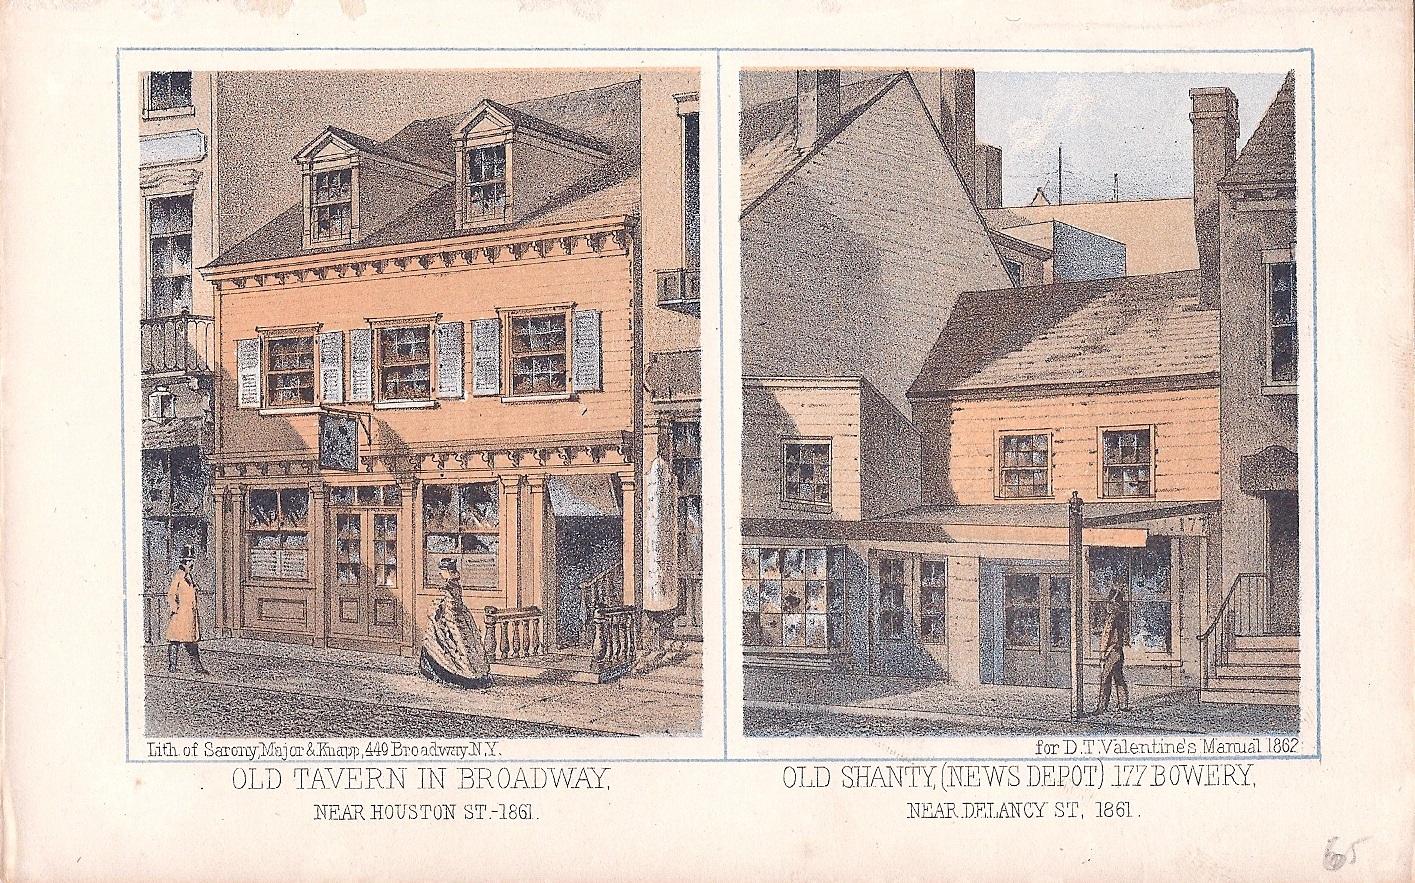 Old Tavern Old Shanty